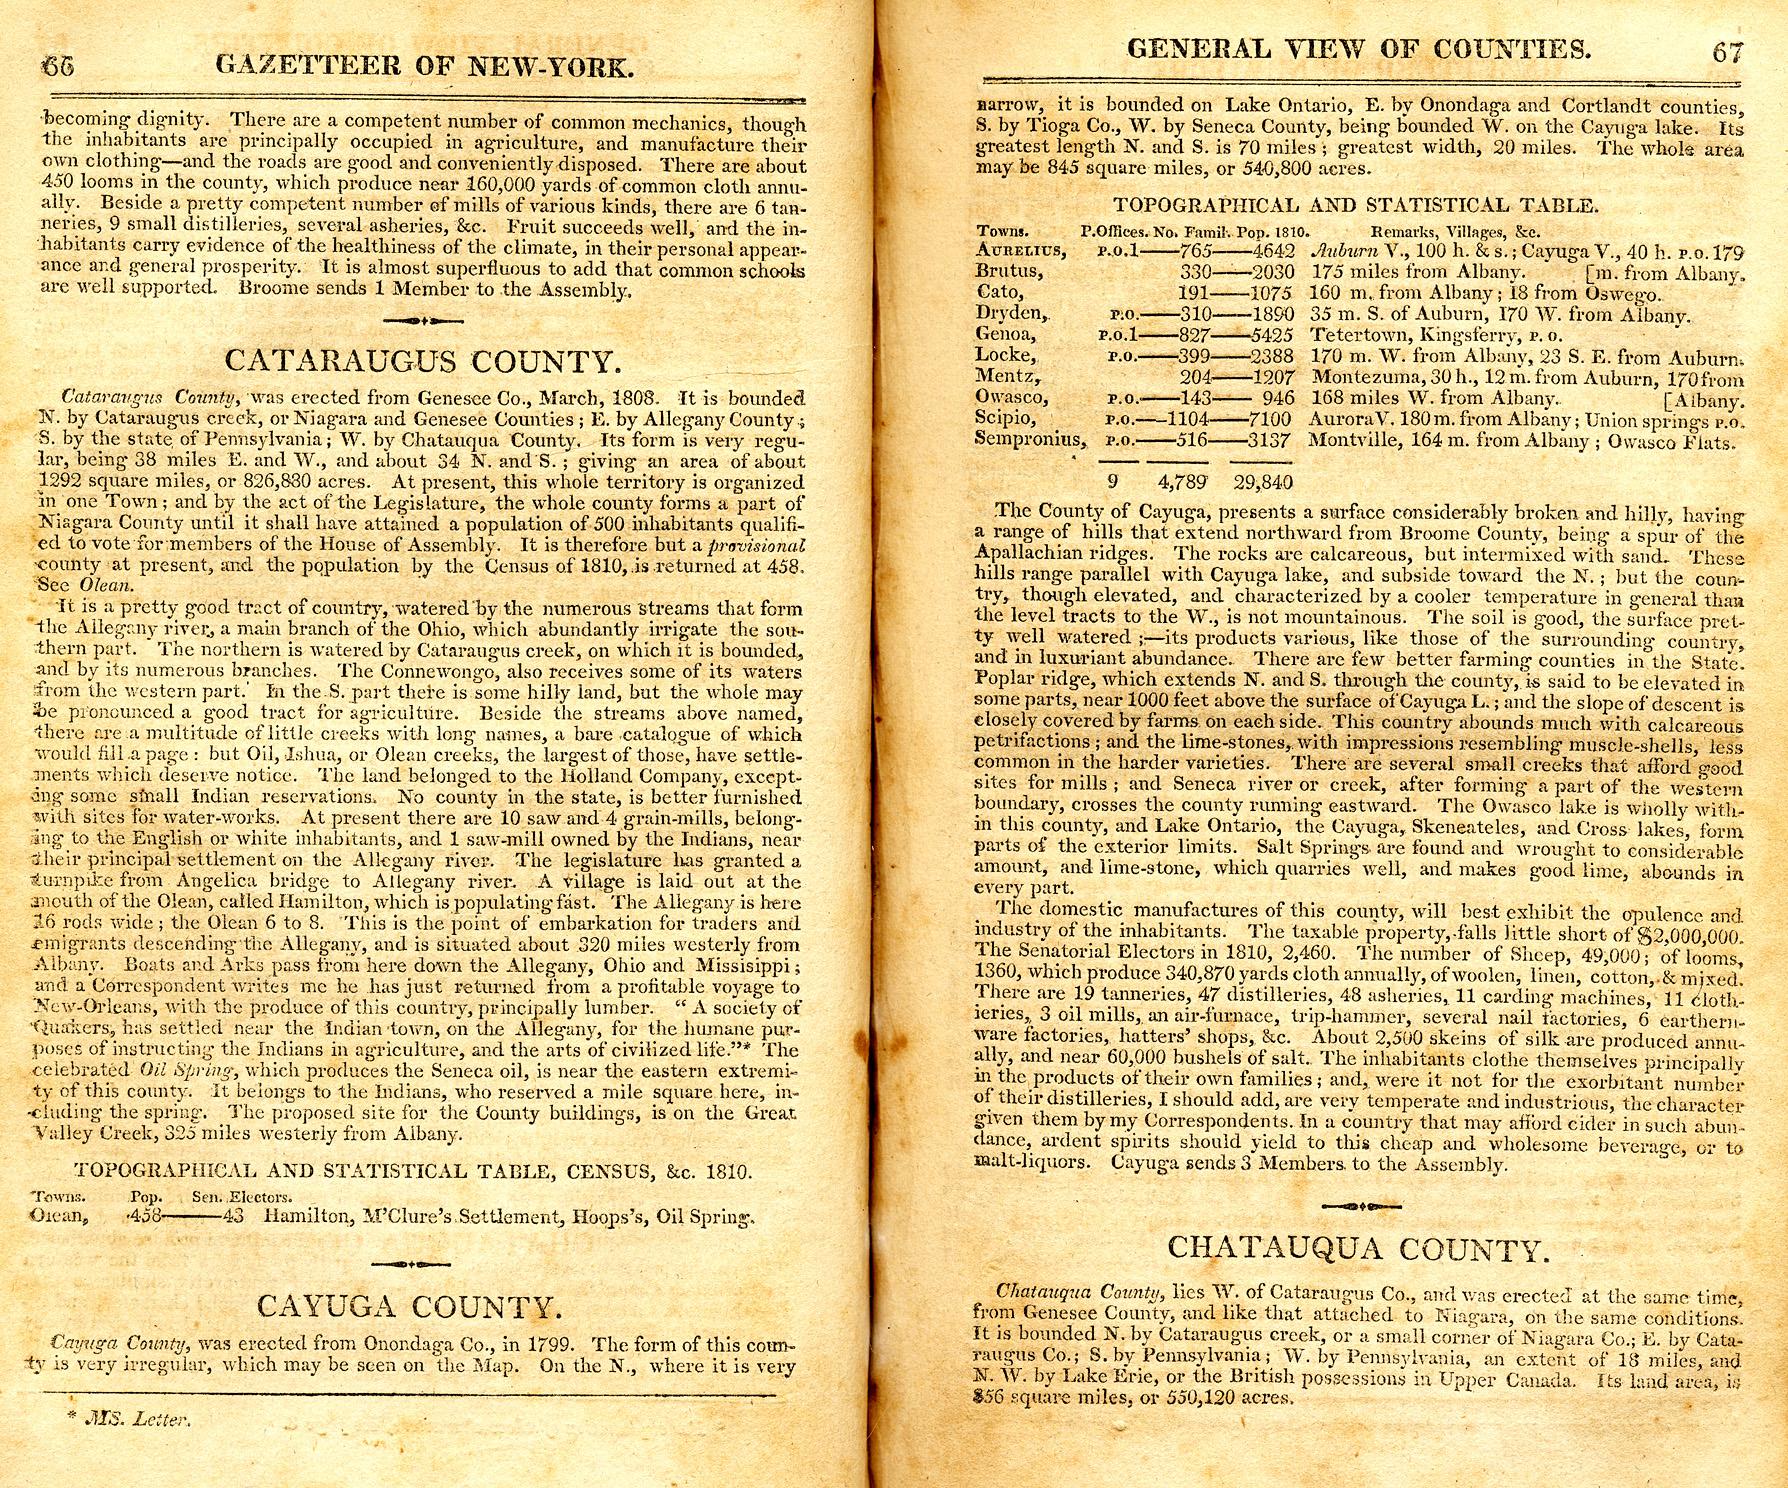 New york cayuga county - 1813 Gazetteer Of New York Page 66 67 Cayuga County Info